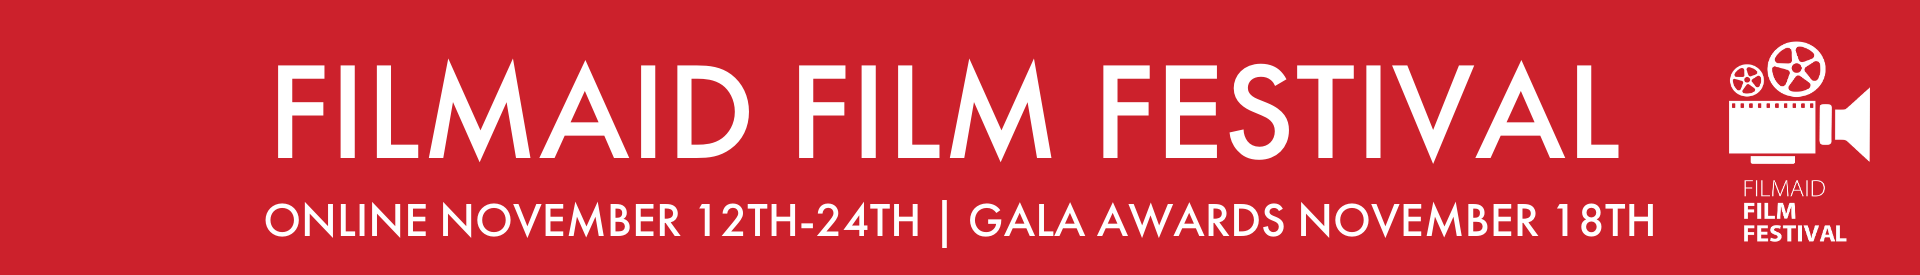 FilmAid Film Festival 2020